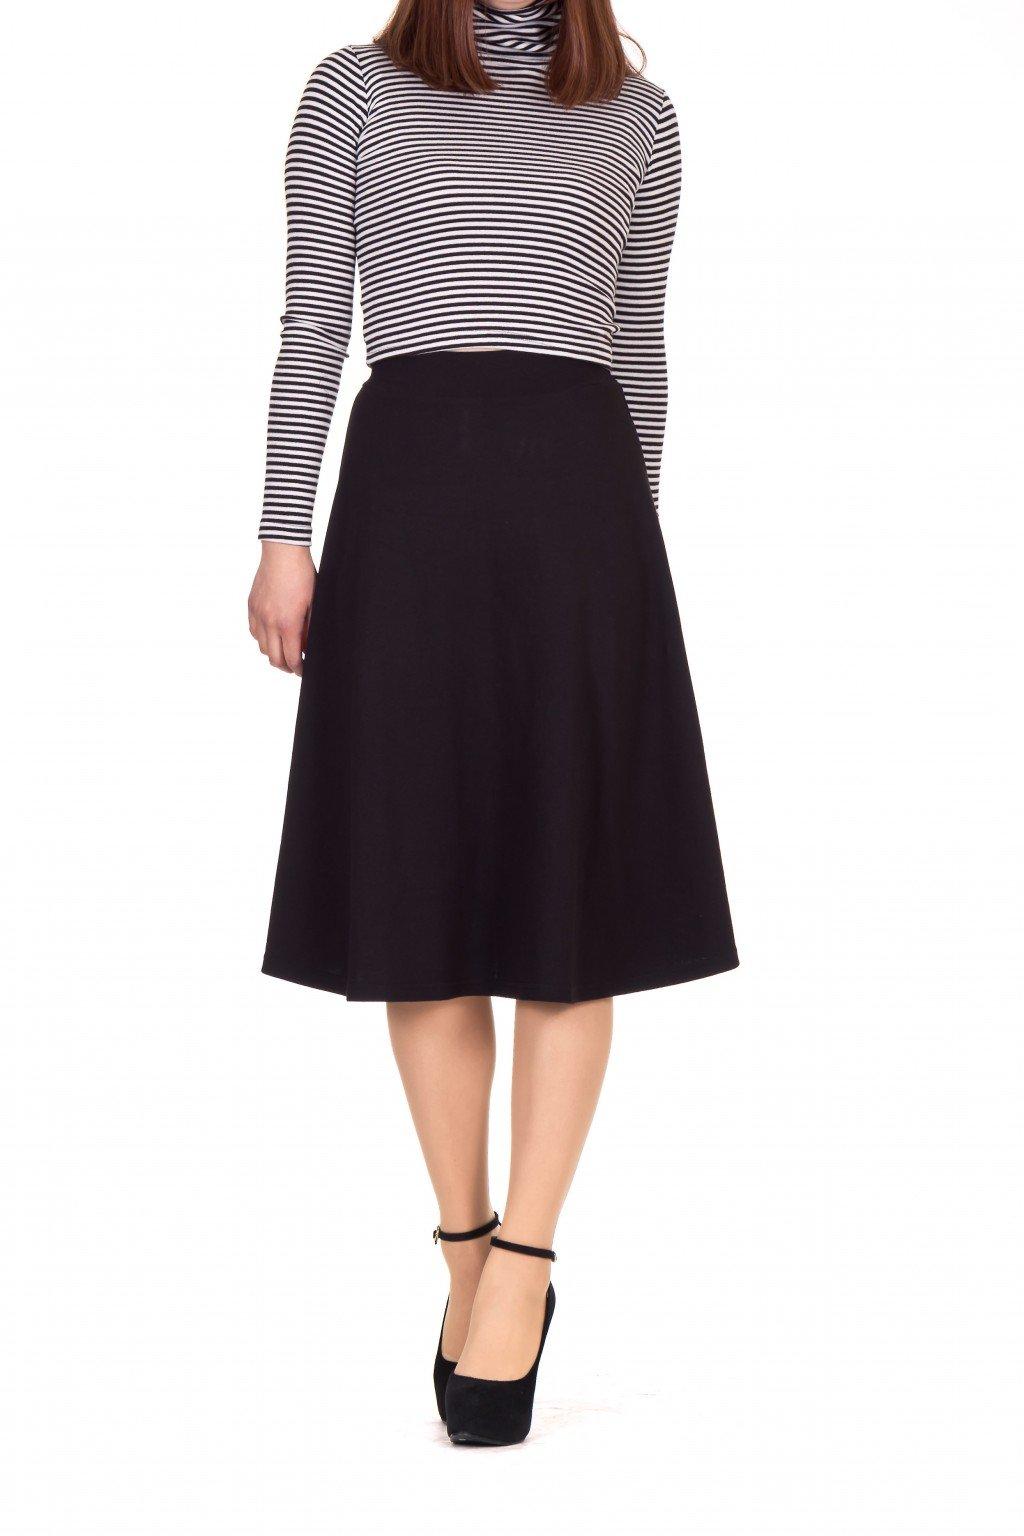 Dani's Choice Everyday High Waist A-Line Flared Skater Midi Skirt (M, Black)